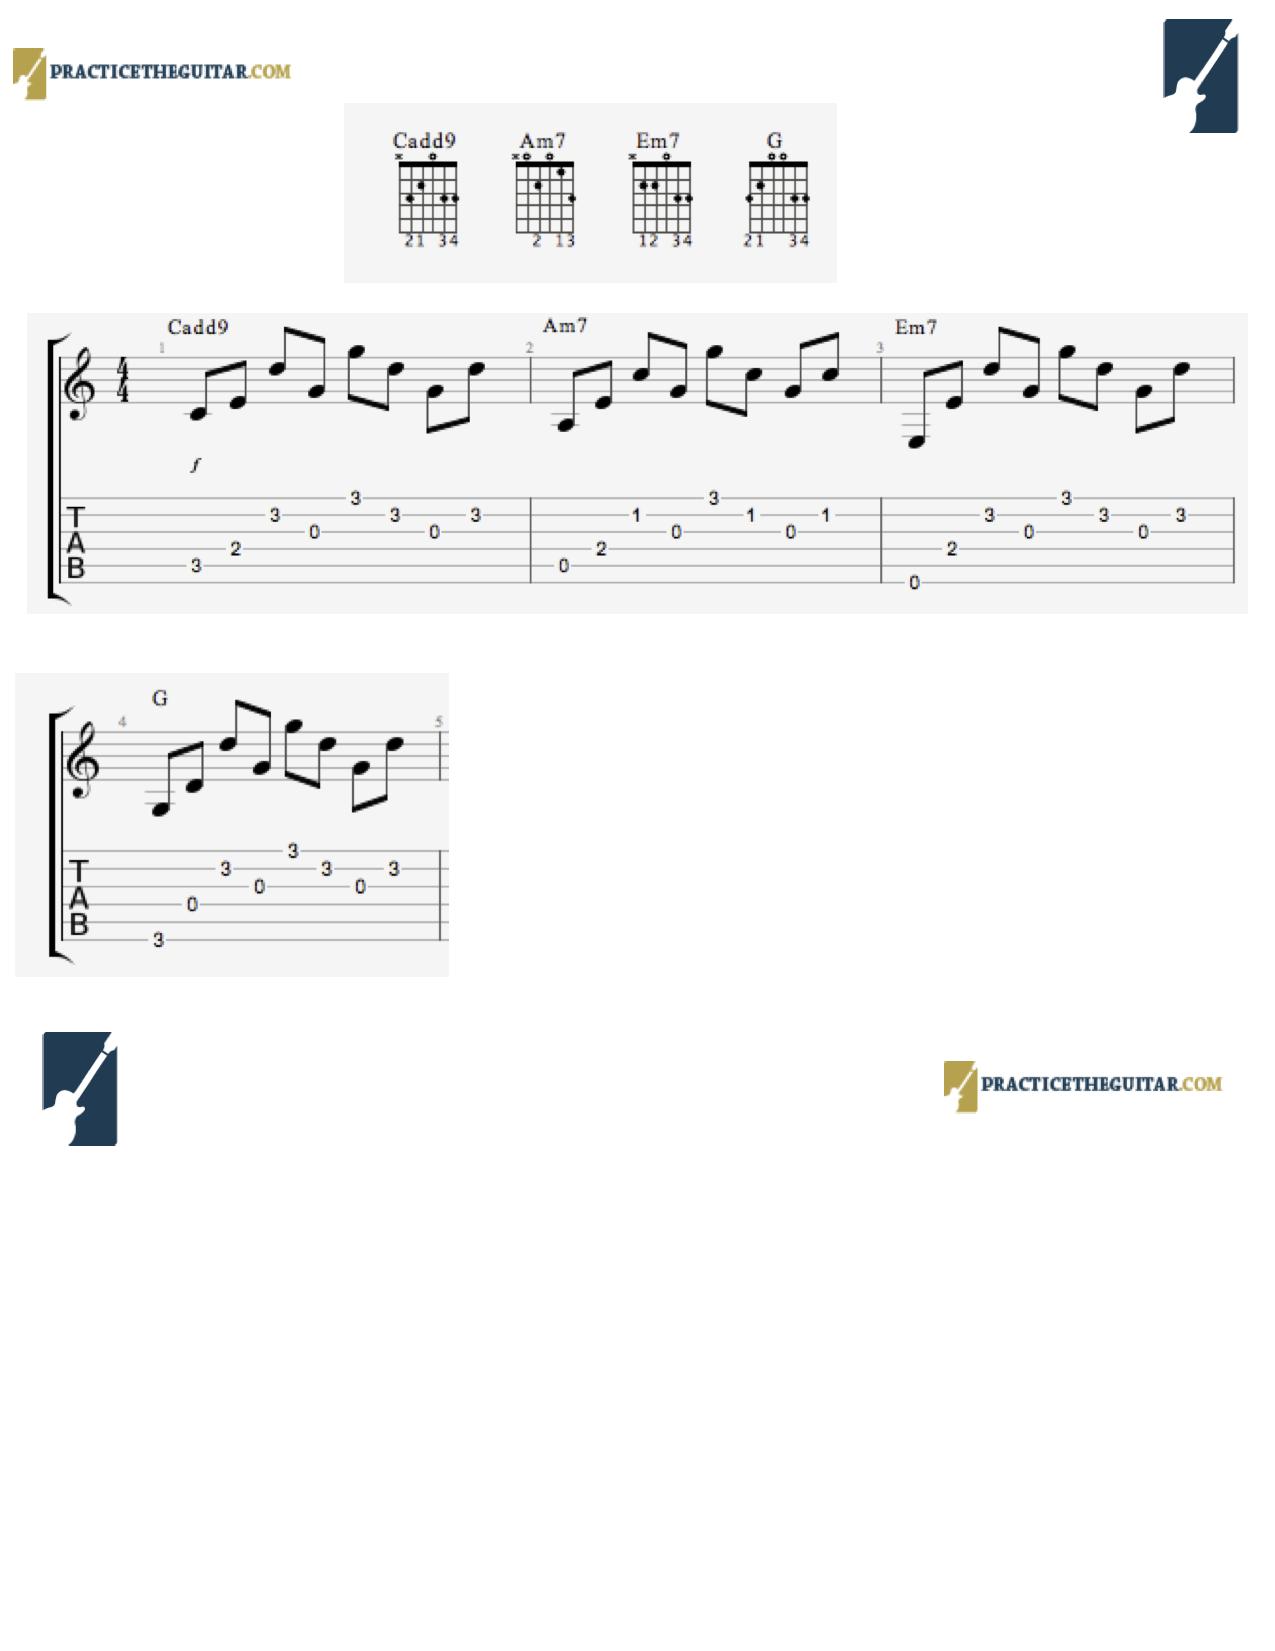 Practicetheguitar Open Chord Arpeggio Picking Pattern 1